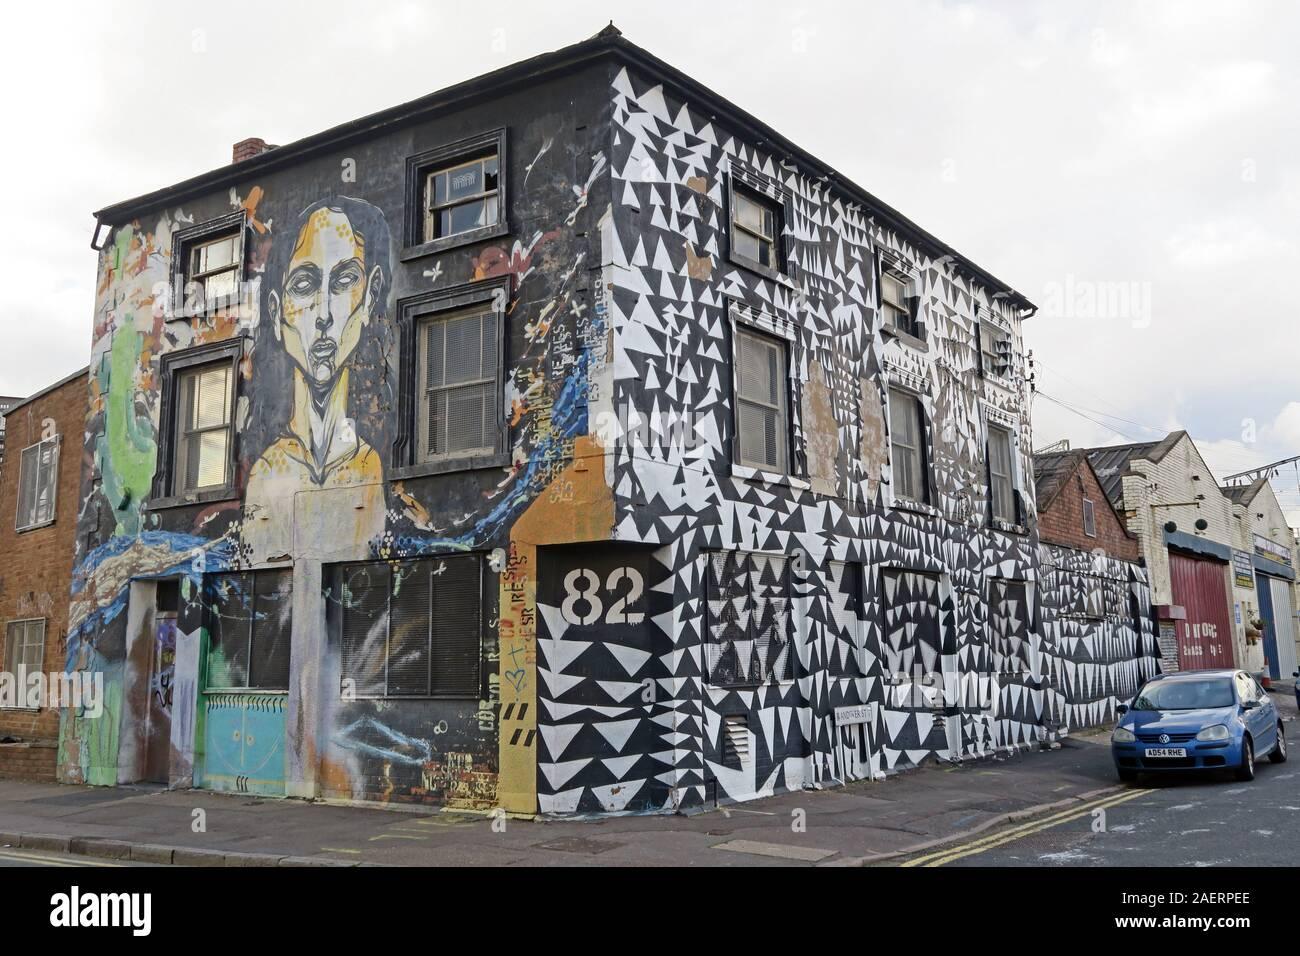 @HotpixUK,Hotpixuk,GoTonySmith,B5,Graffiti urban street art,in Floodgate St,Bordesley & Highgate,Birmingham,West Midlands,England,UK,B5 5ST,Floodgate St,Graffiti,street,artist,tag,tagged,Deritend,painted,unit,factory,eightytwo,82 Floodgate St,82 Floodgate Street